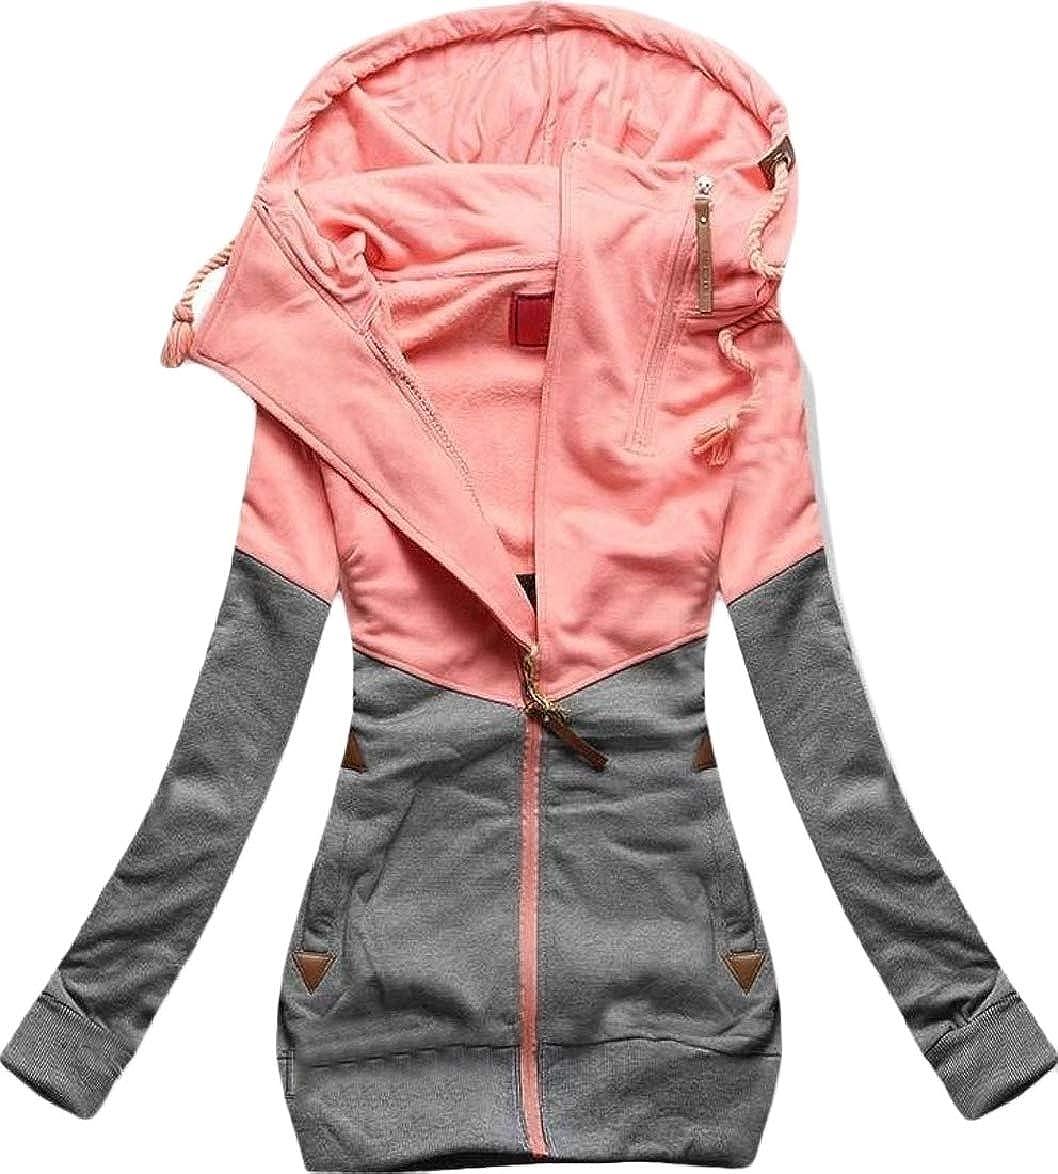 Smeiling-CA Womens Color Block Slim Fit Fleeced Oblique Zipper Hoodie High Neck Coat